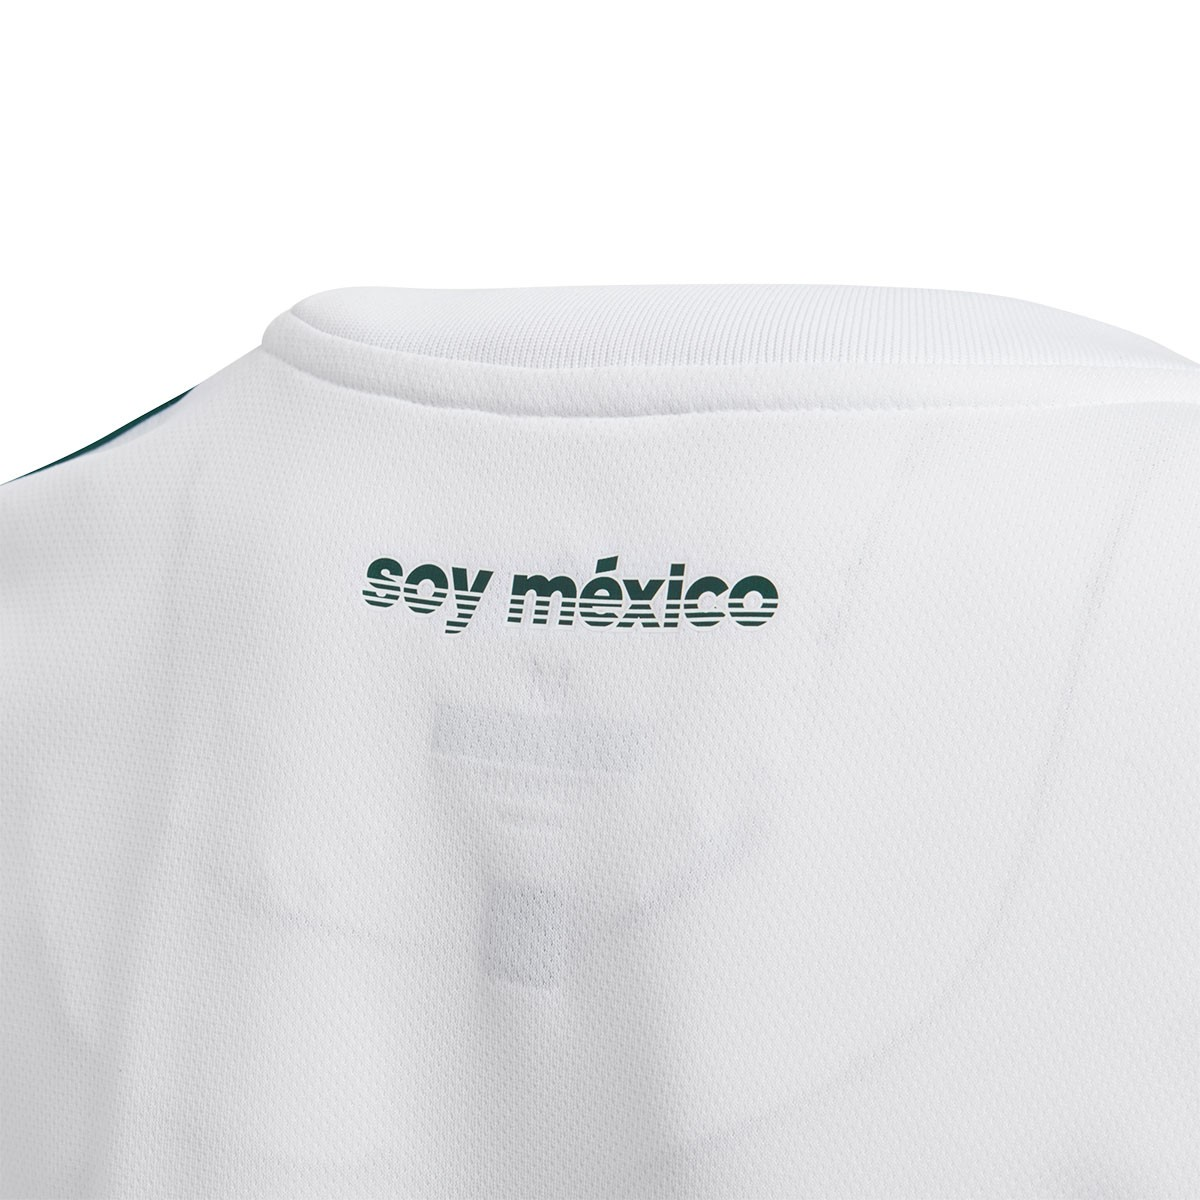 436144aad7047 Camiseta adidas México Segunda Equipación 2017-2018 Niño White-Collegiate  green-Collegiate burgundy - Tienda de fútbol Fútbol Emotion